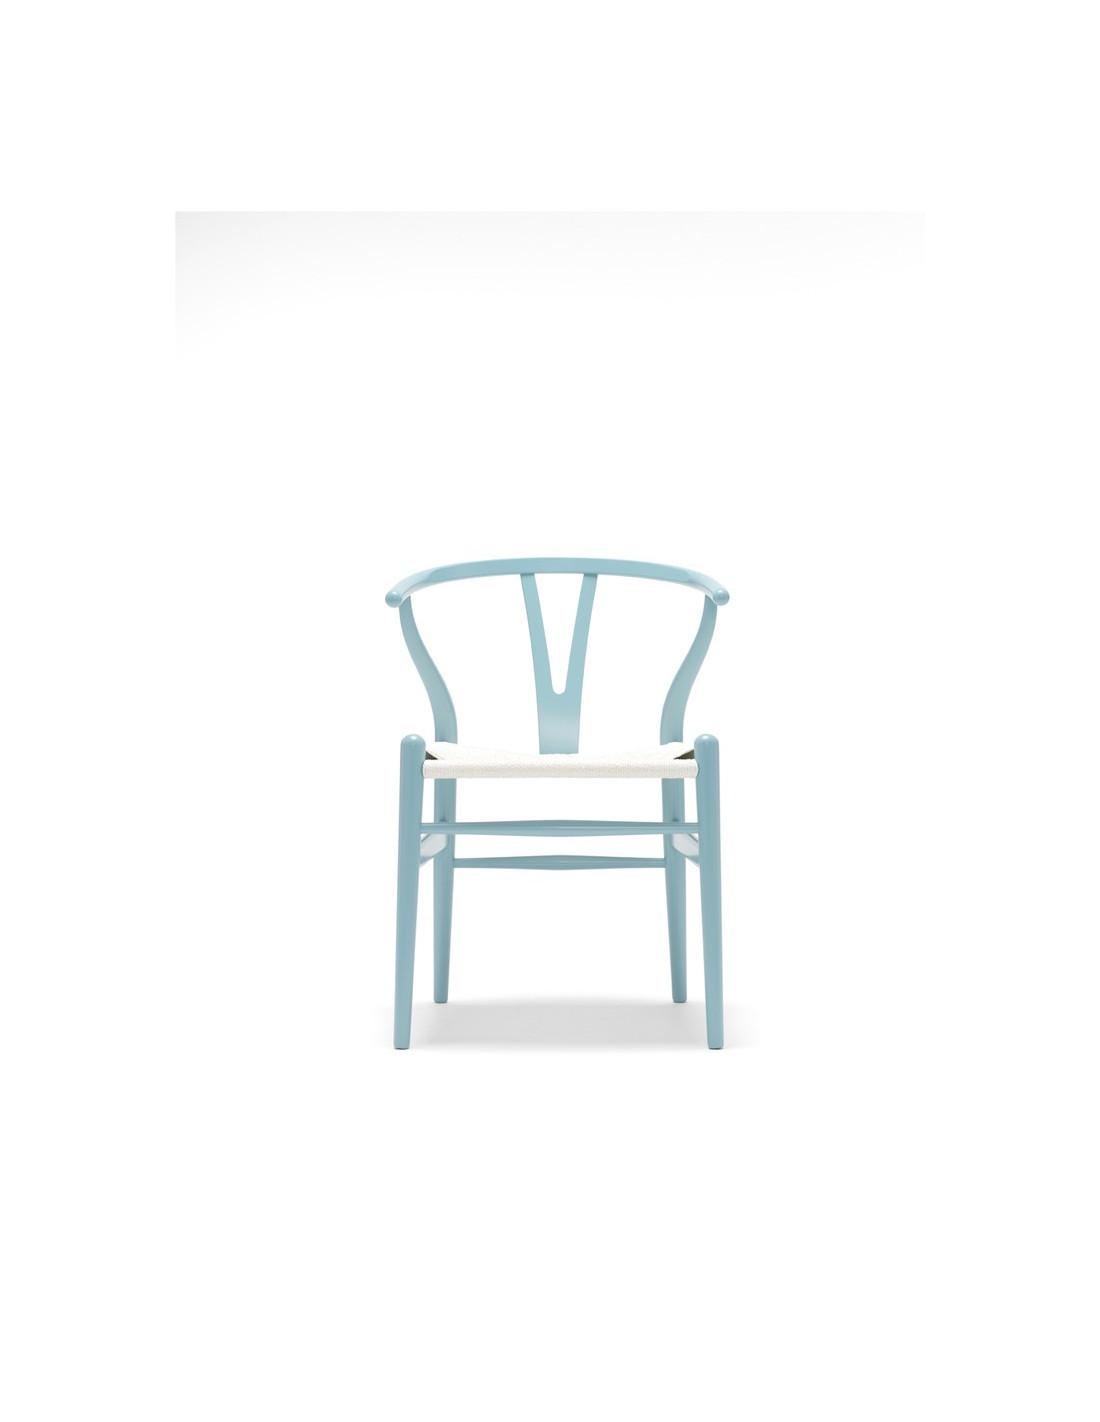 CH24 Wishbone Chair Hans Wegner design for Carl Hansen